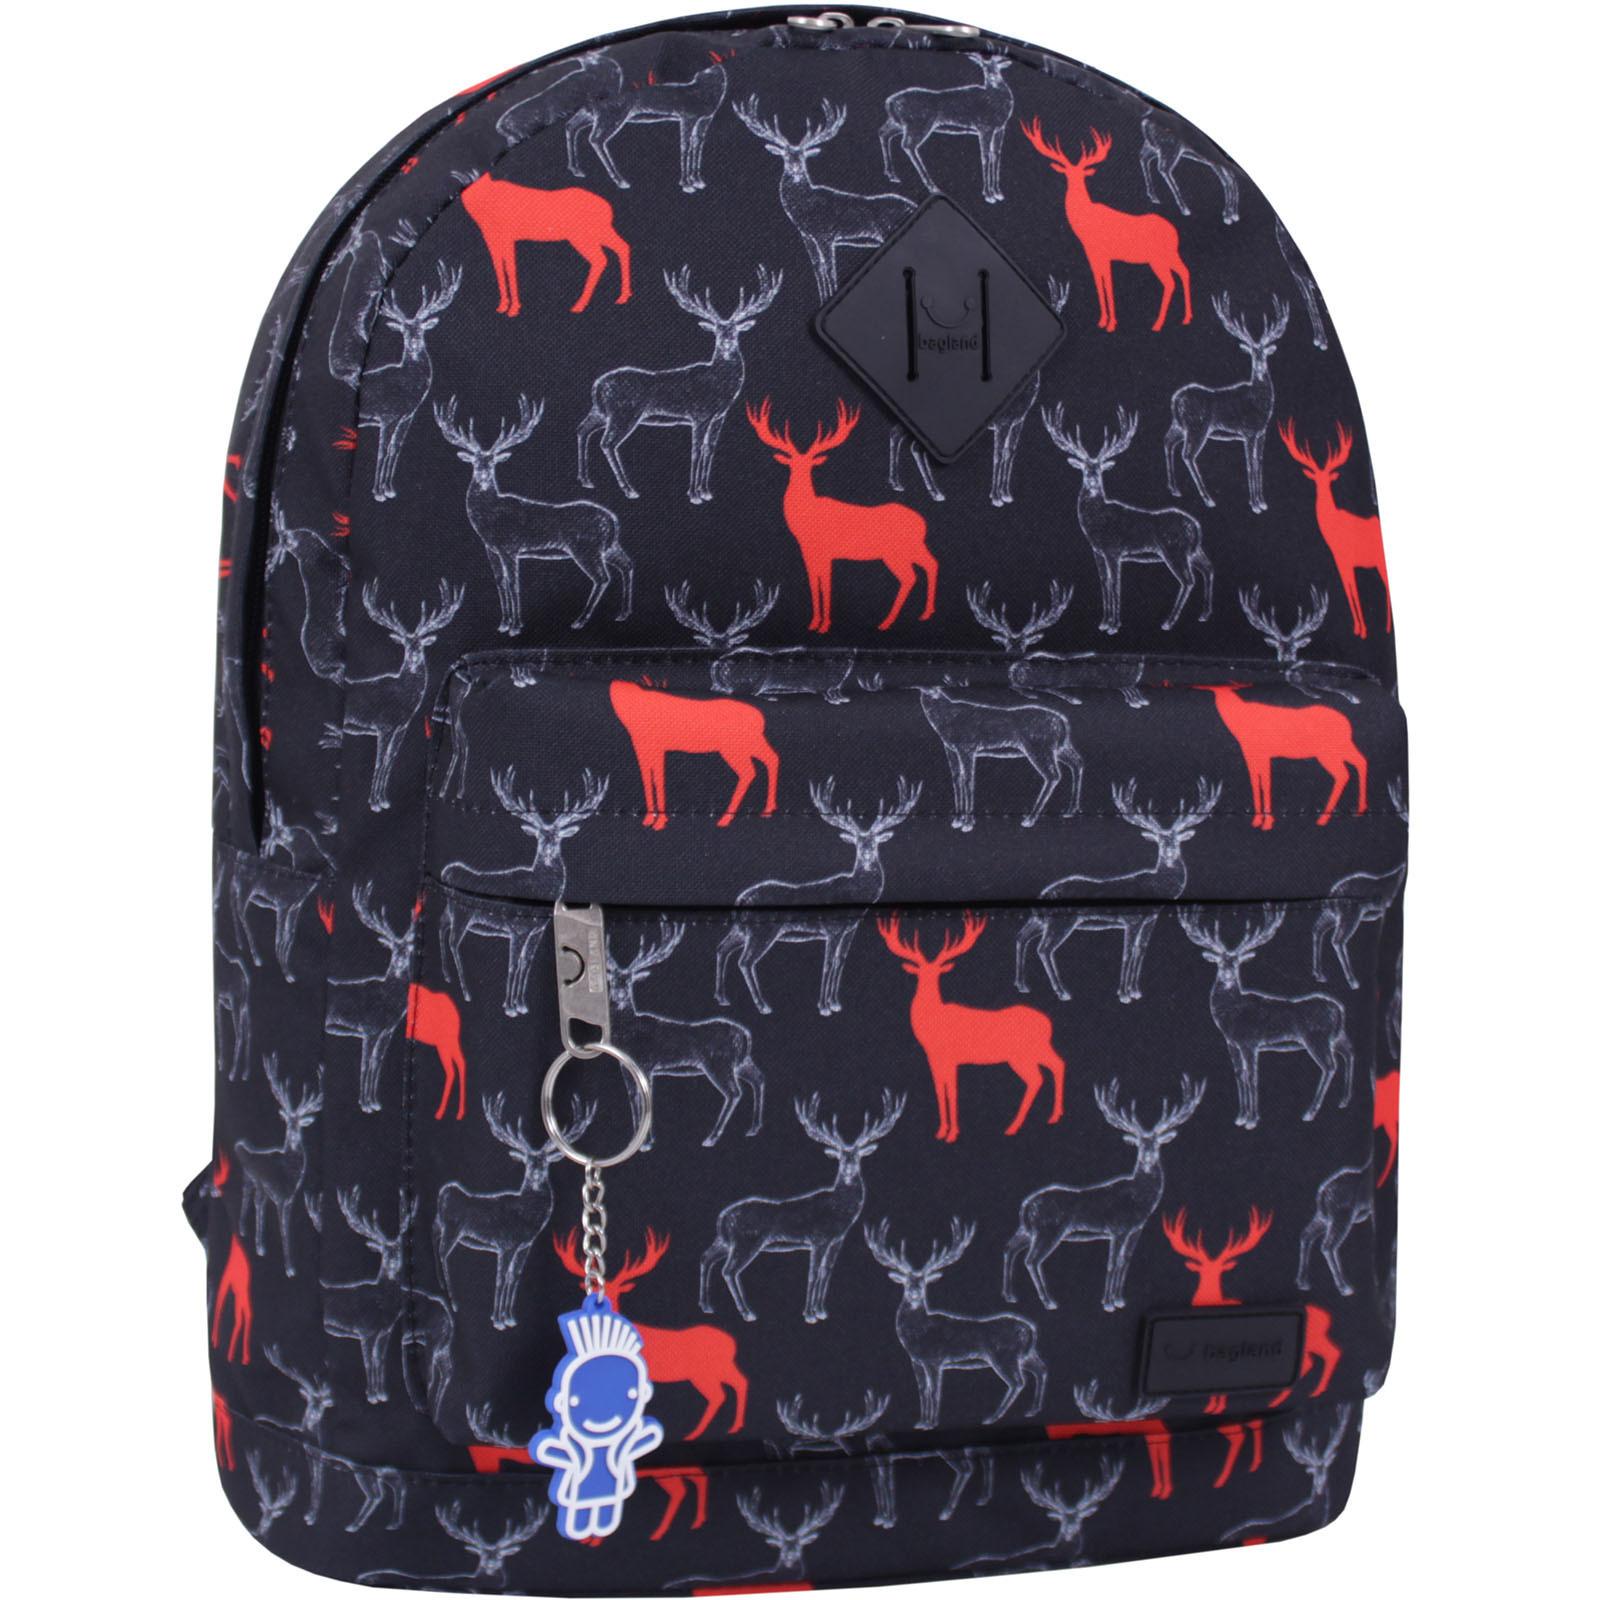 Молодежные рюкзаки Рюкзак Bagland Молодежный 17 л. сублимация 471 (00533664) IMG_9411_суб.471_.JPG